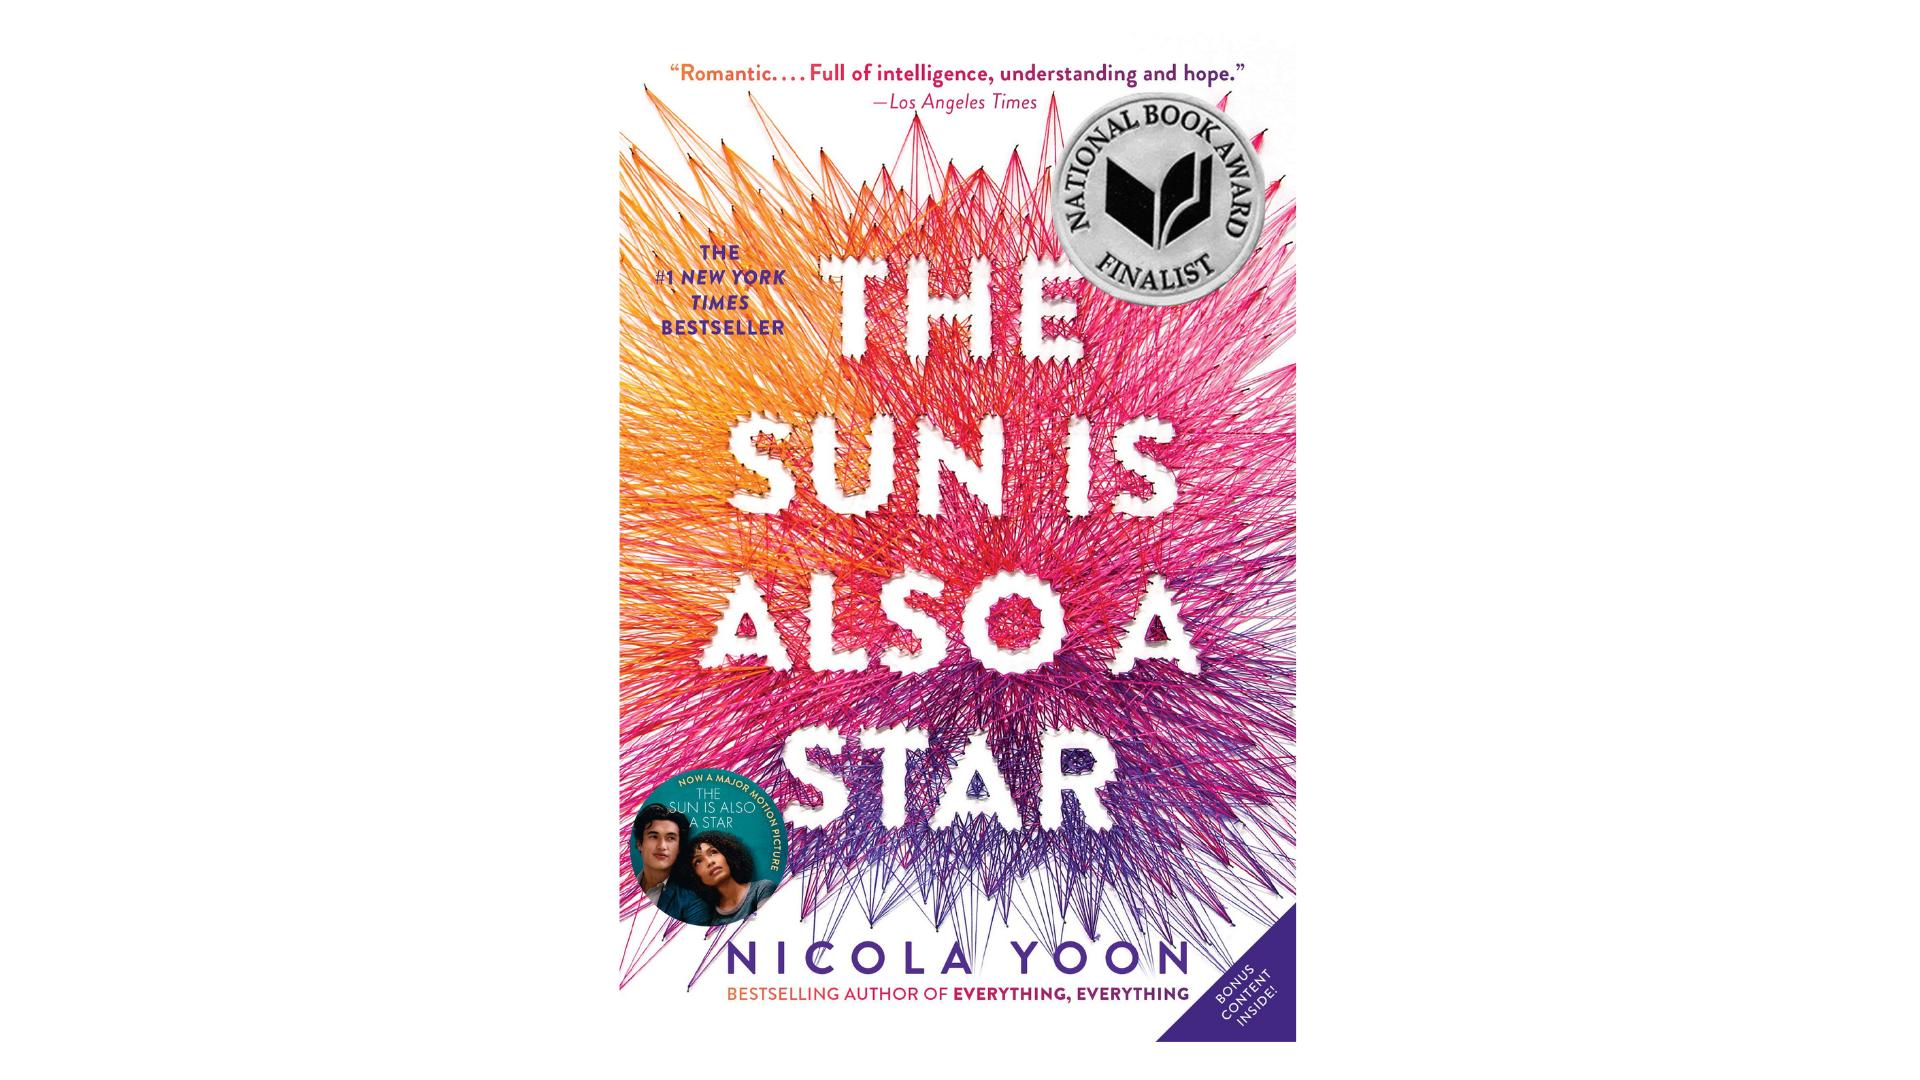 Nicola Yoon best books by black authors